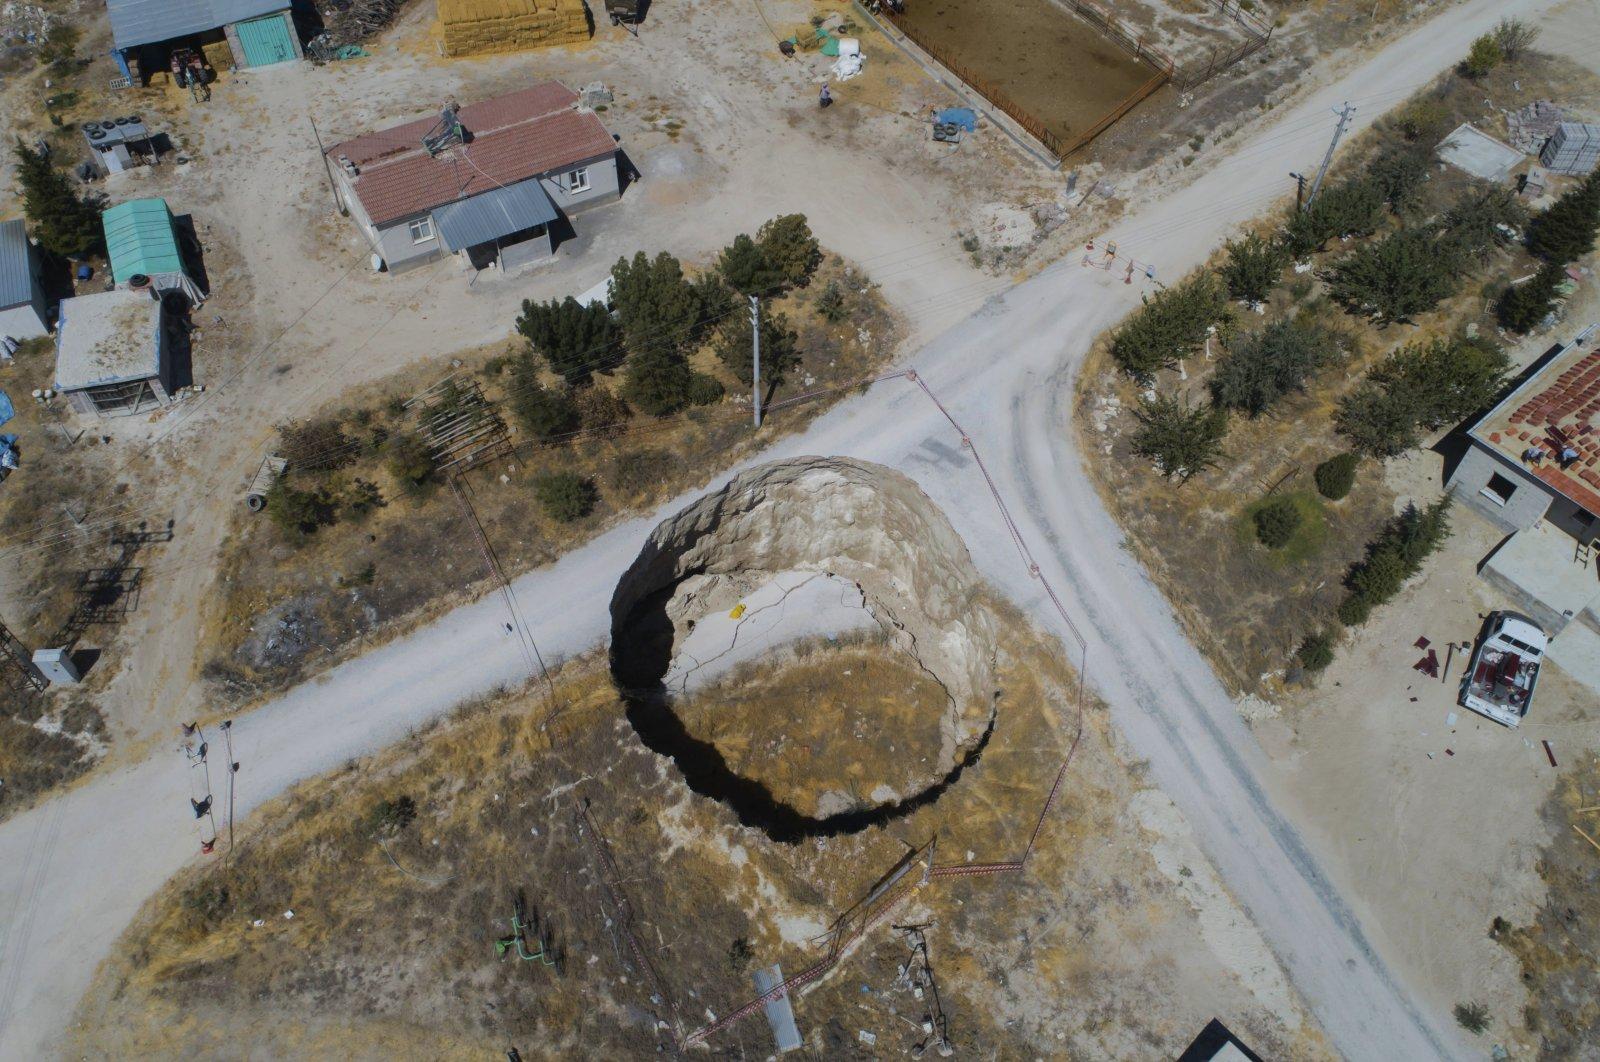 An aerial view of a sinkhole in Karapınar district, in Konya, central Turkey, Feb. 11, 2021. (DHA PHOTO)